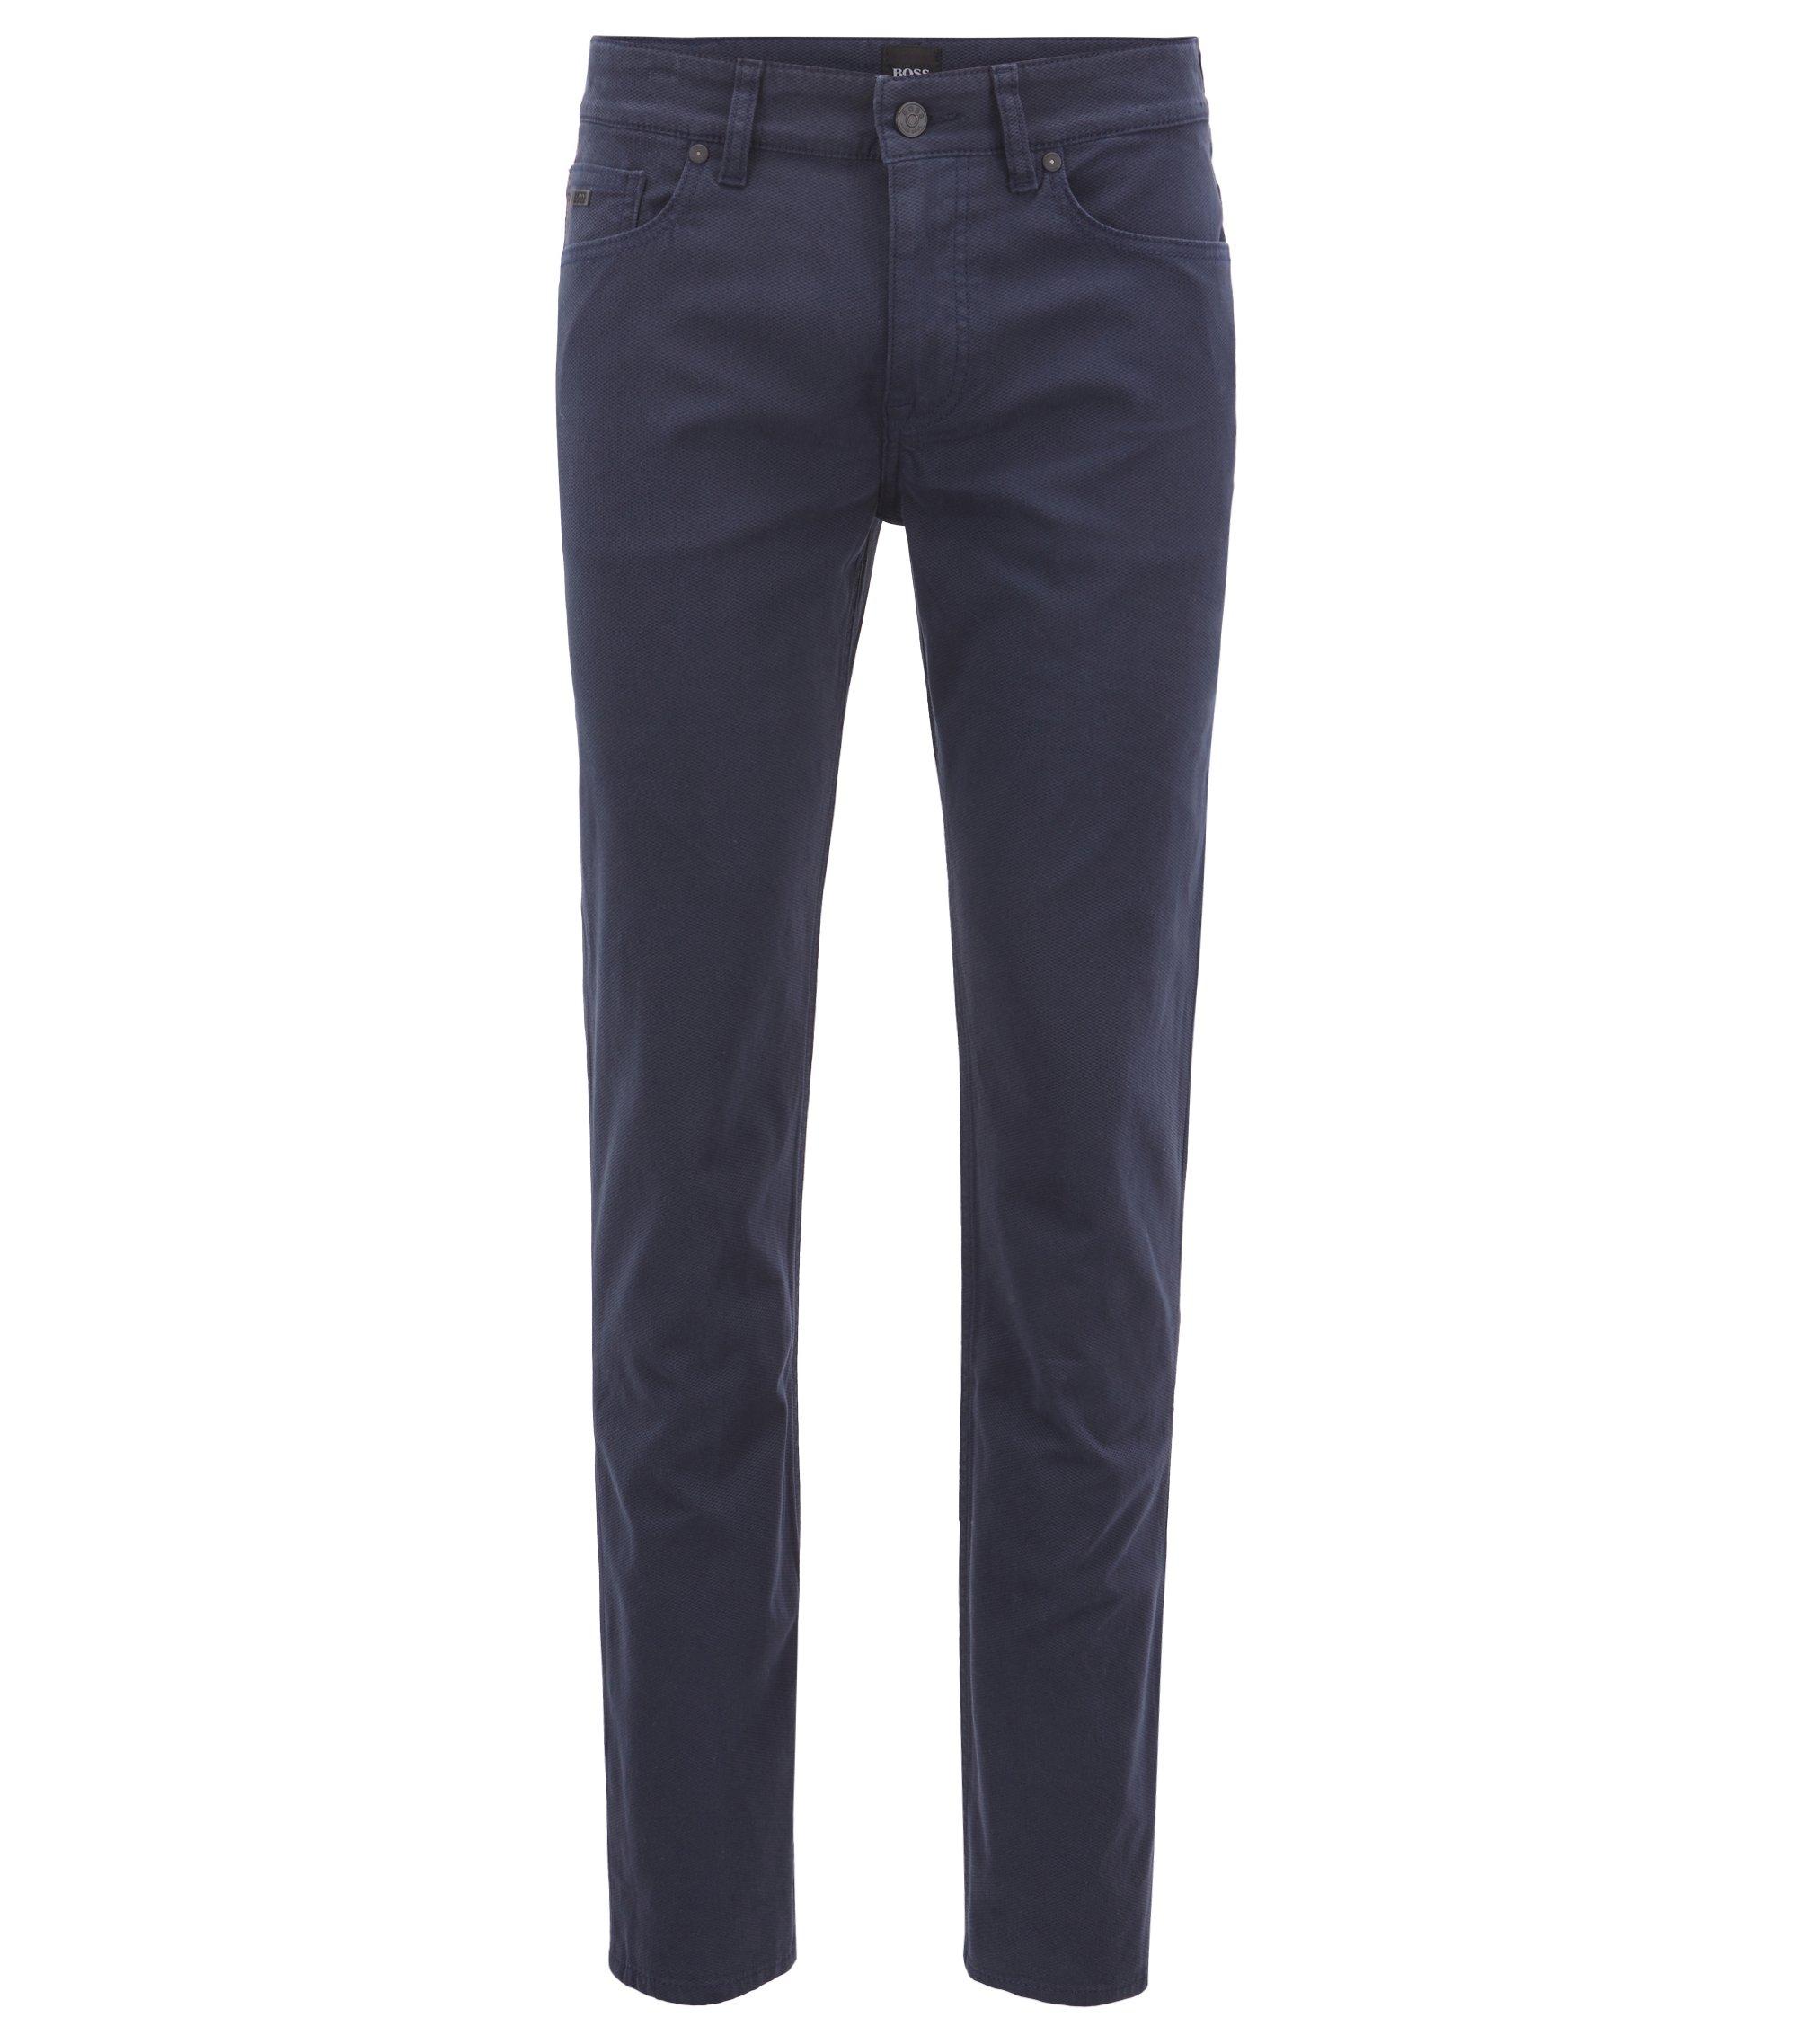 Slim-Fit Jeans aus Stretch-Denim mit Mikro-Struktur, Dunkelblau